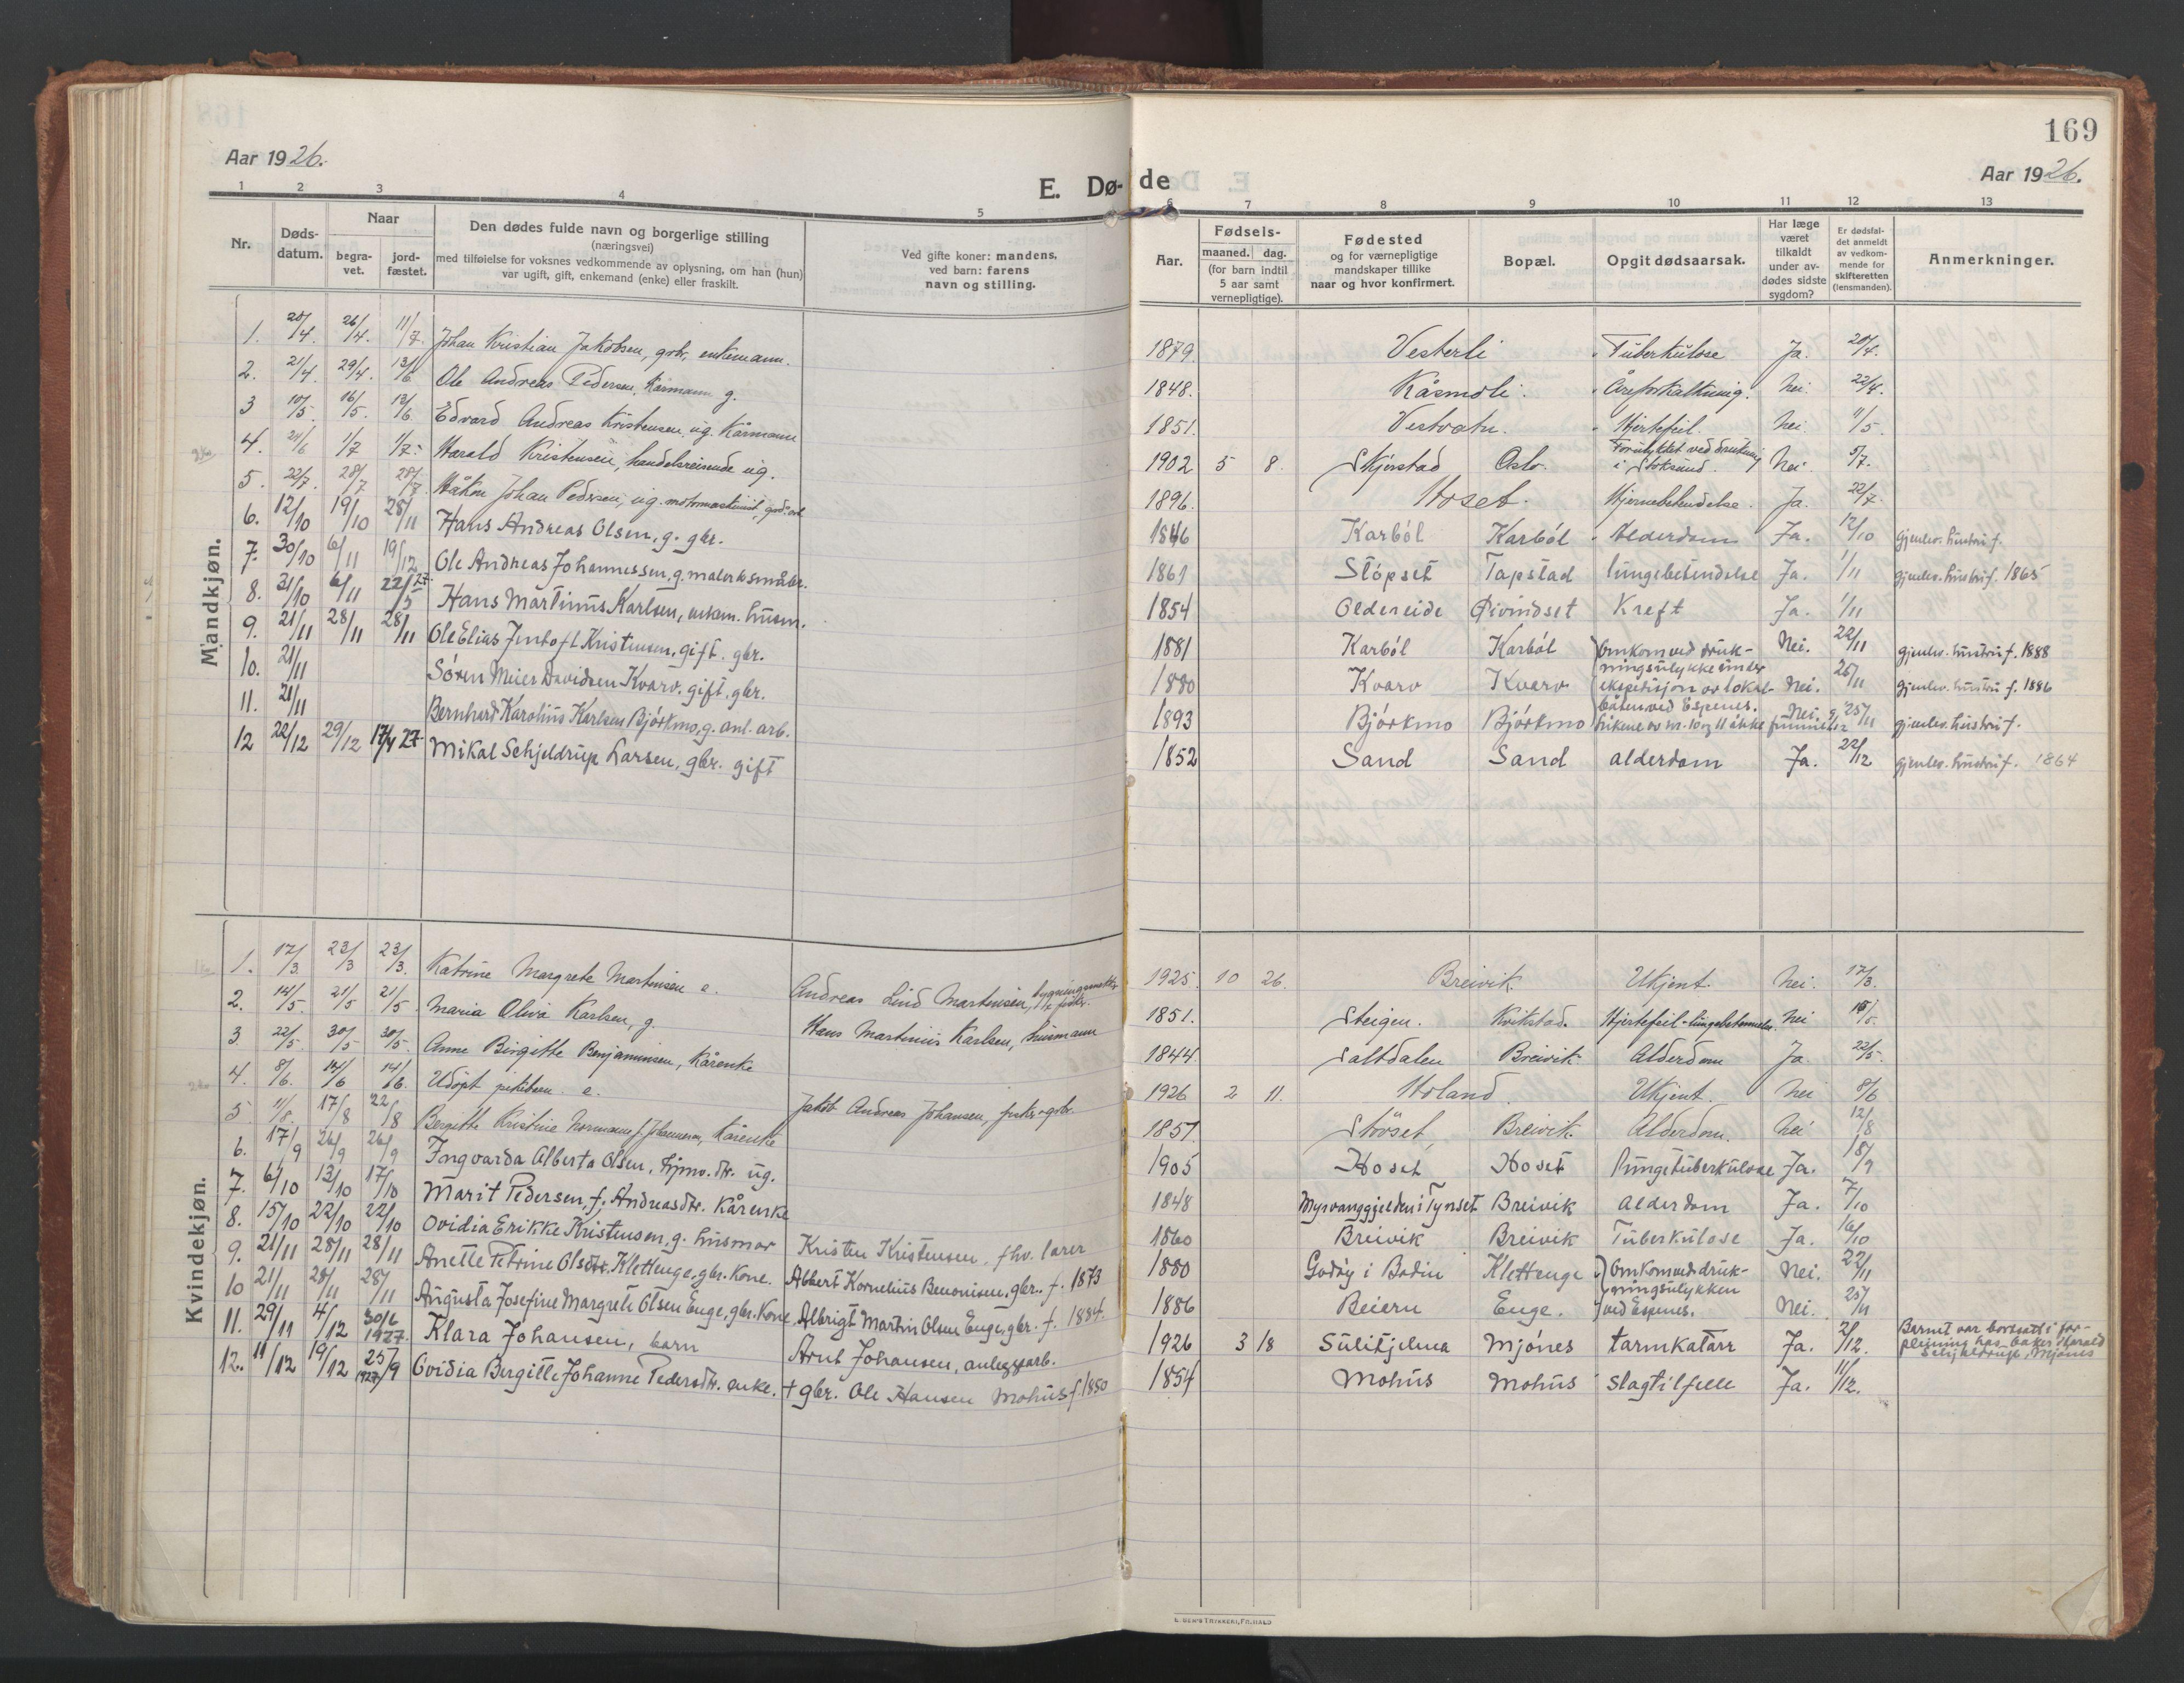 SAT, Ministerialprotokoller, klokkerbøker og fødselsregistre - Nordland, 852/L0748: Ministerialbok nr. 852A18, 1913-1932, s. 169